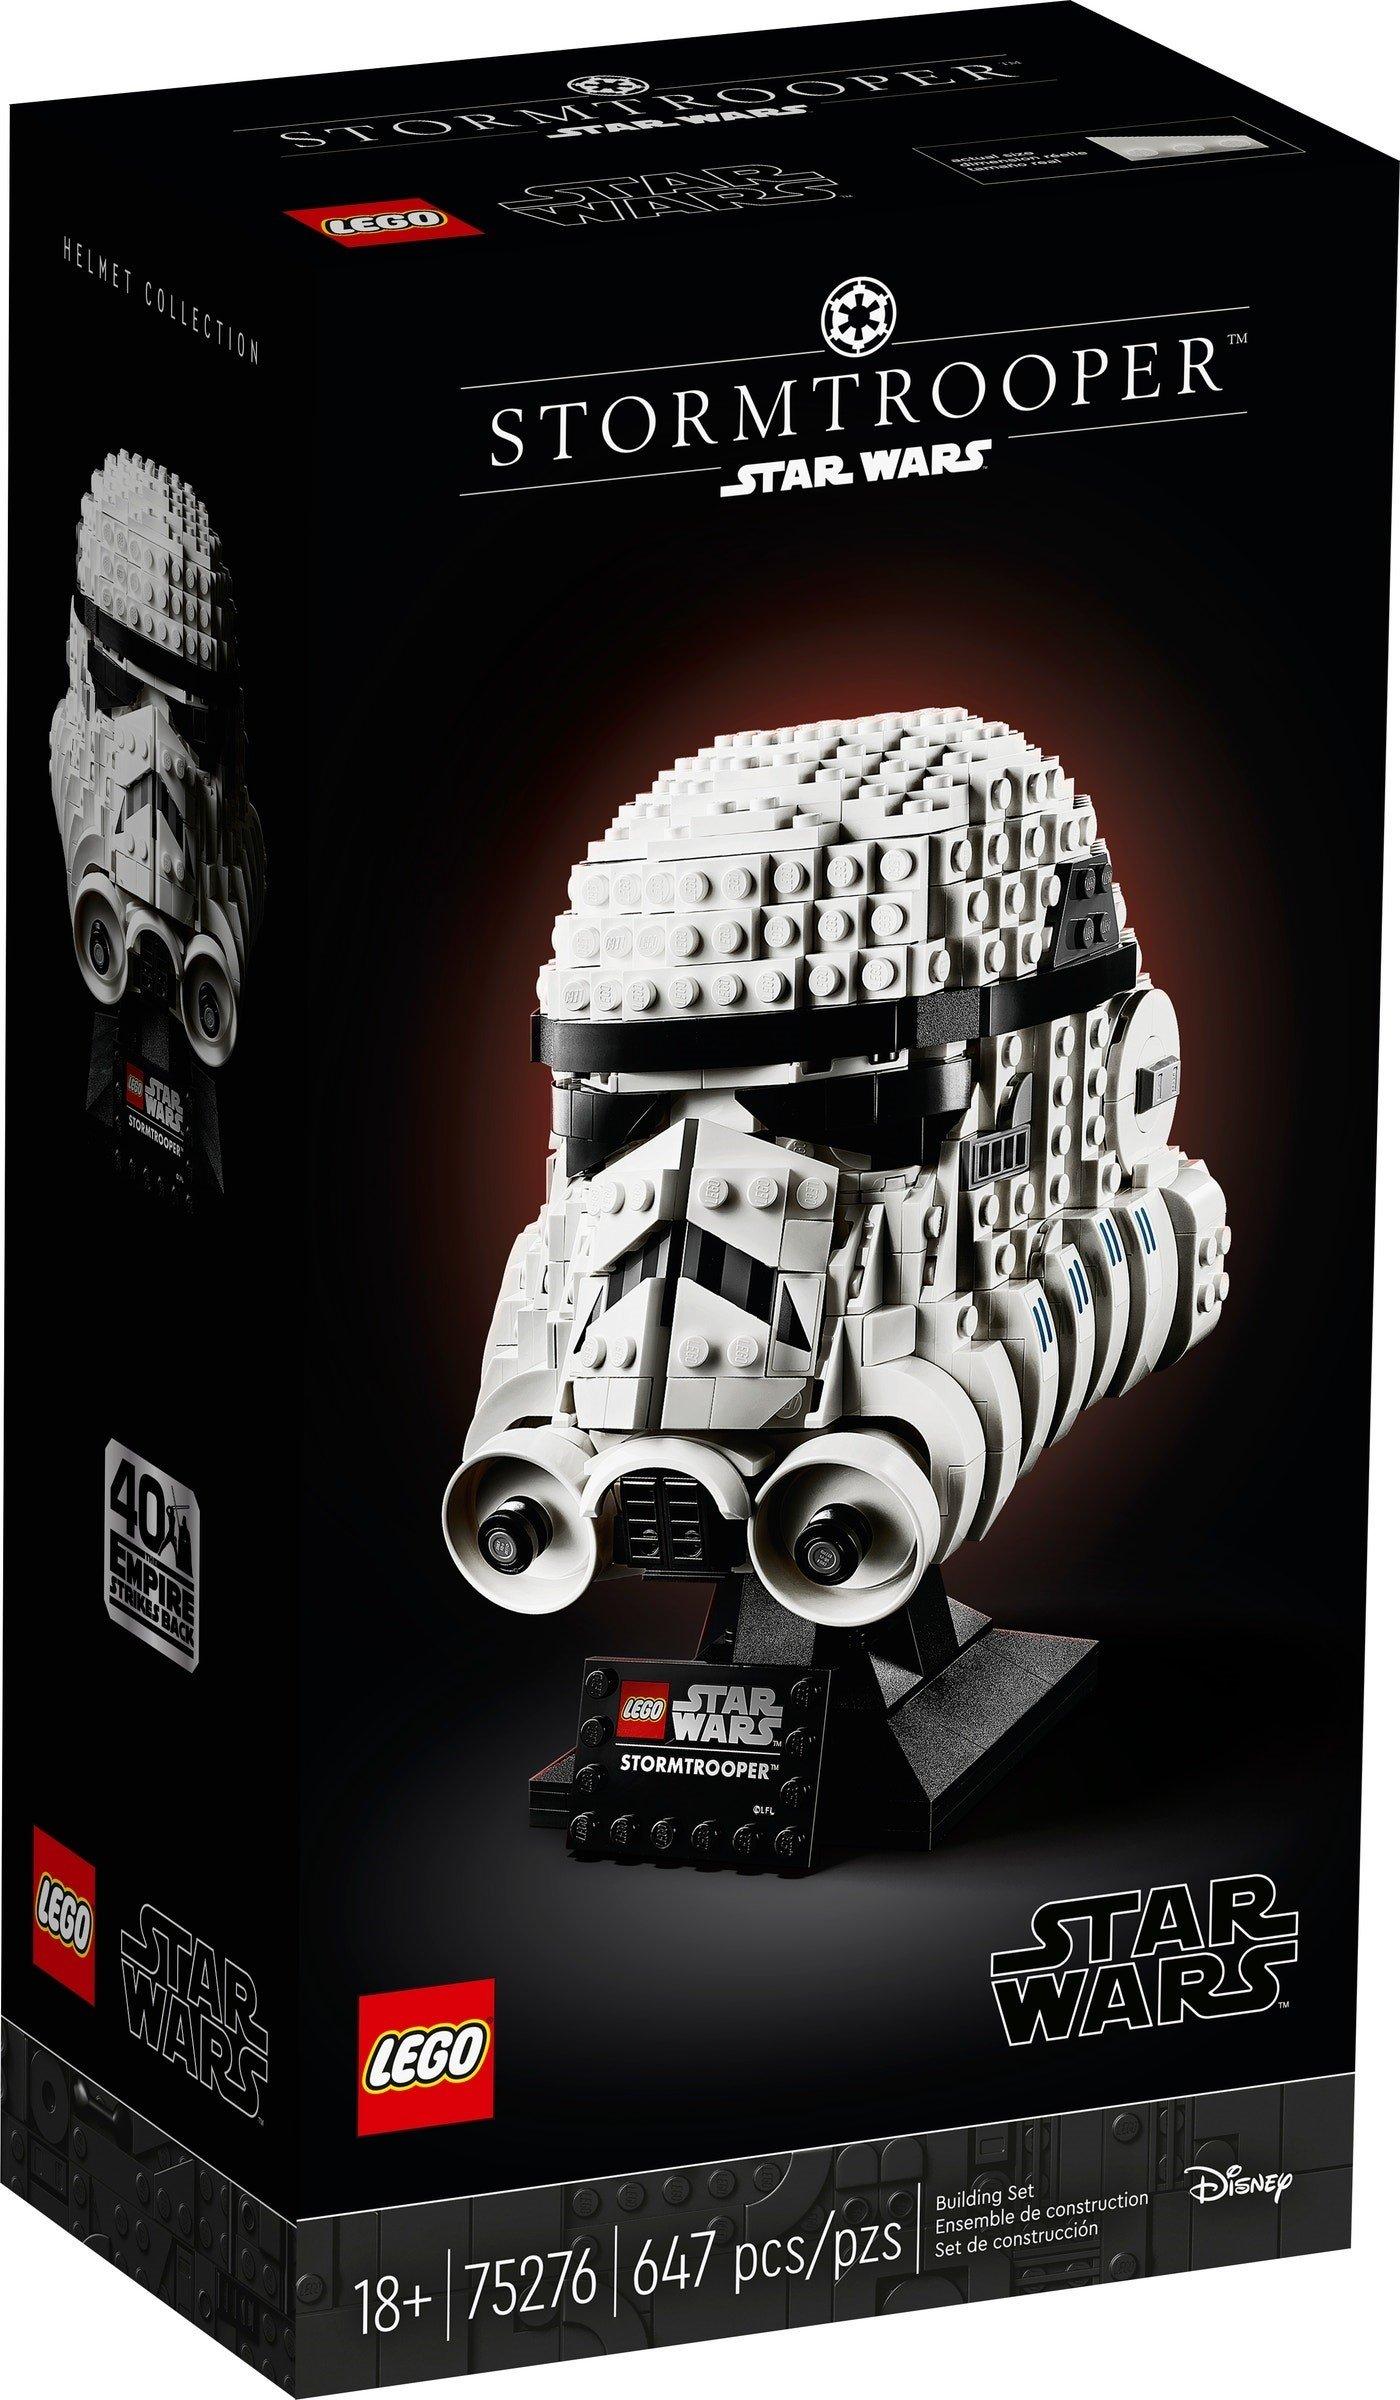 LEGO Star Wars - Stormtrooper Helmet (75276)